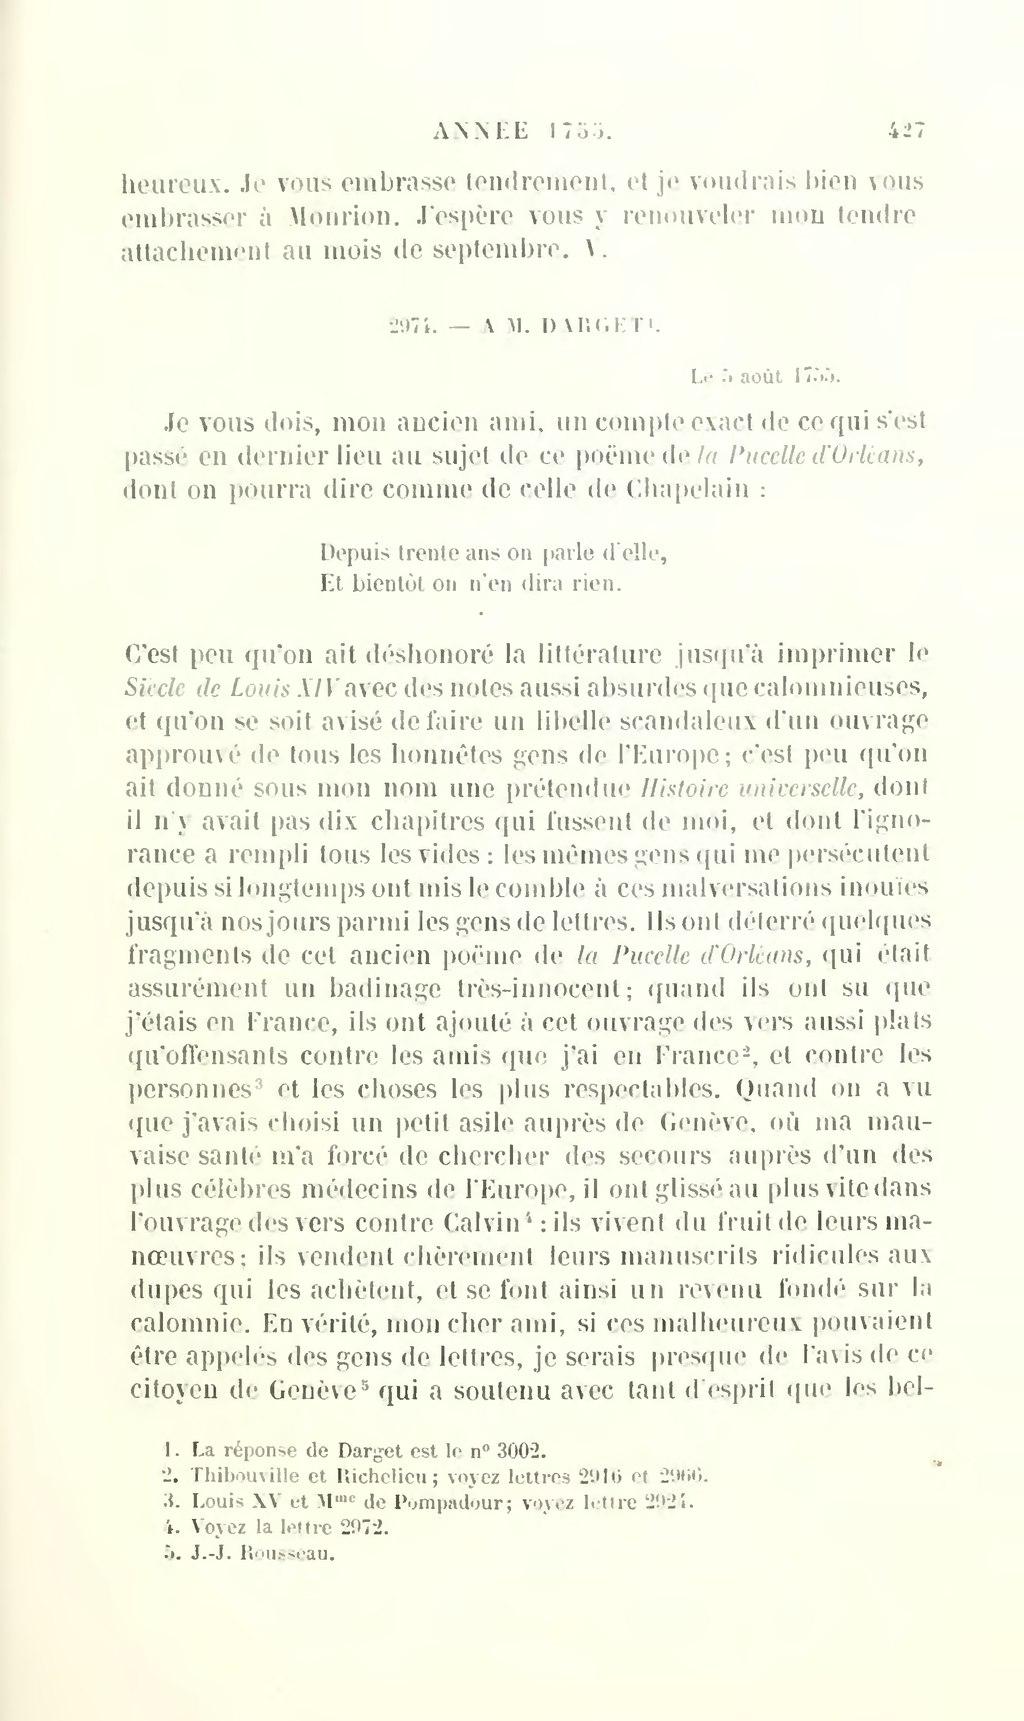 Pagevoltaire œuvres Complètes Garnier Tome38djvu437